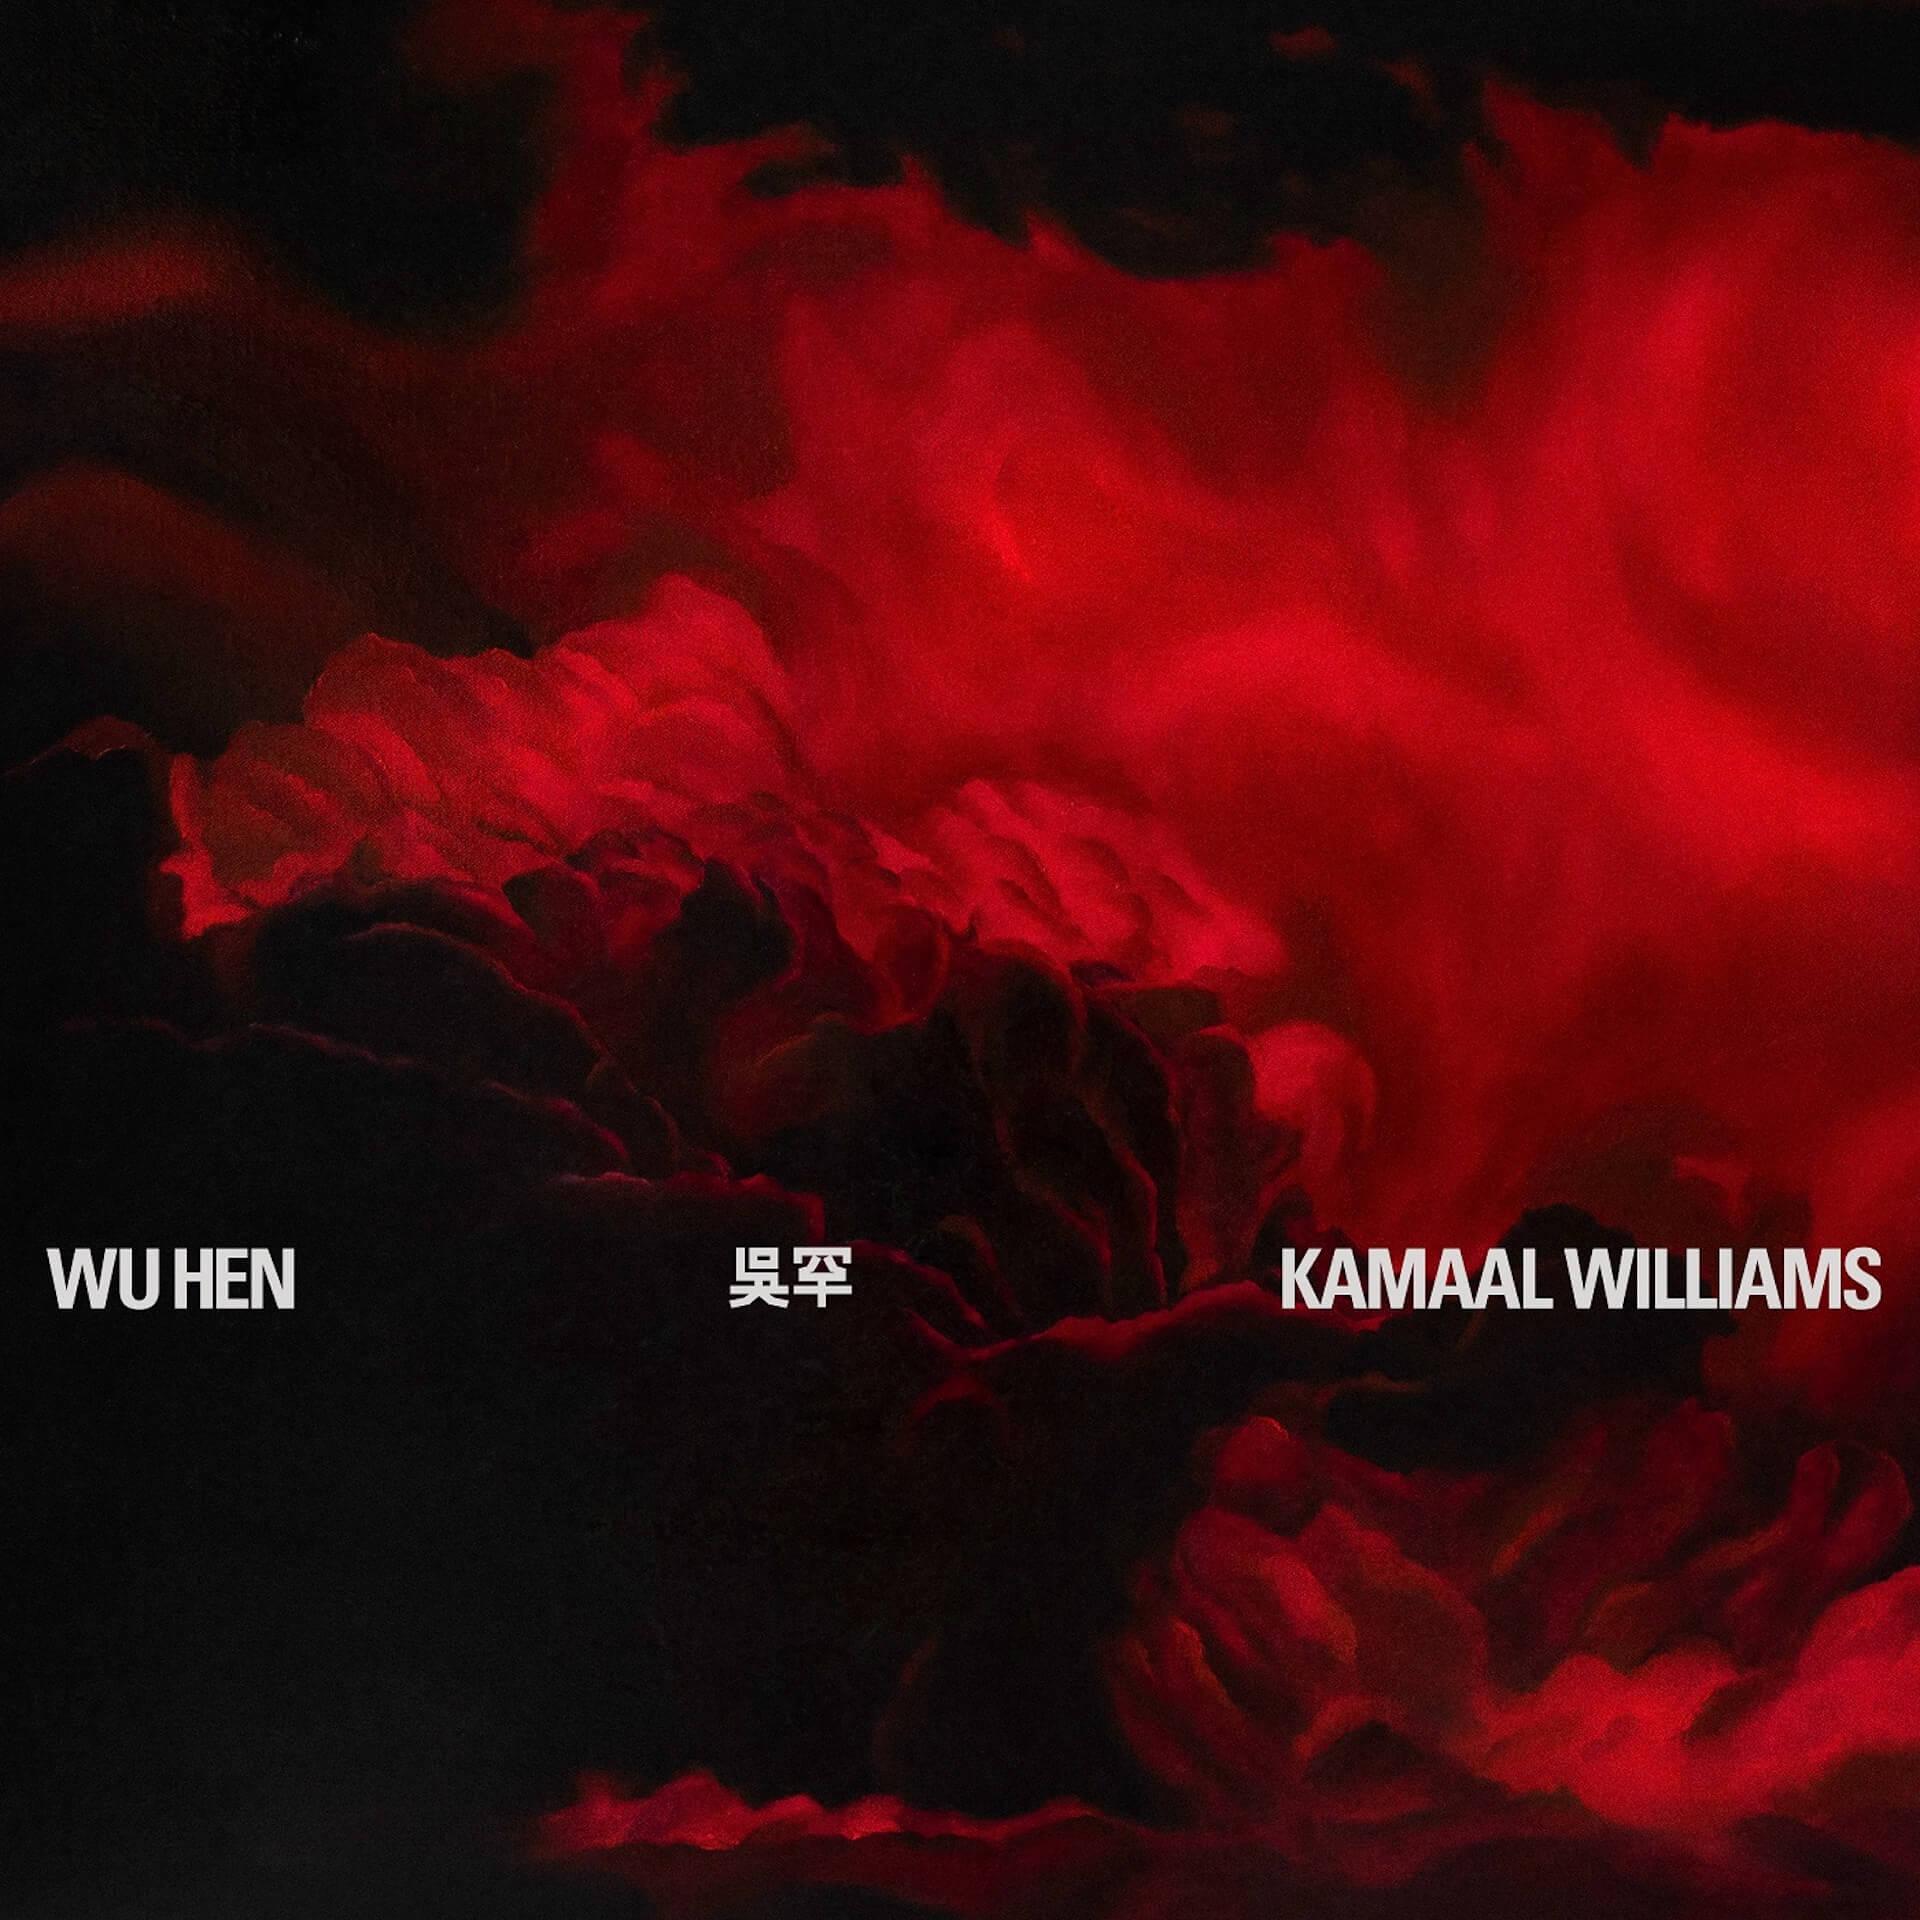 Kamaal WilliamsことHenry Wuがニューアルバム『Wu Hen』を自身のレーベルからリリース決定!新曲も発表 music200527_kamaalwilliams_2